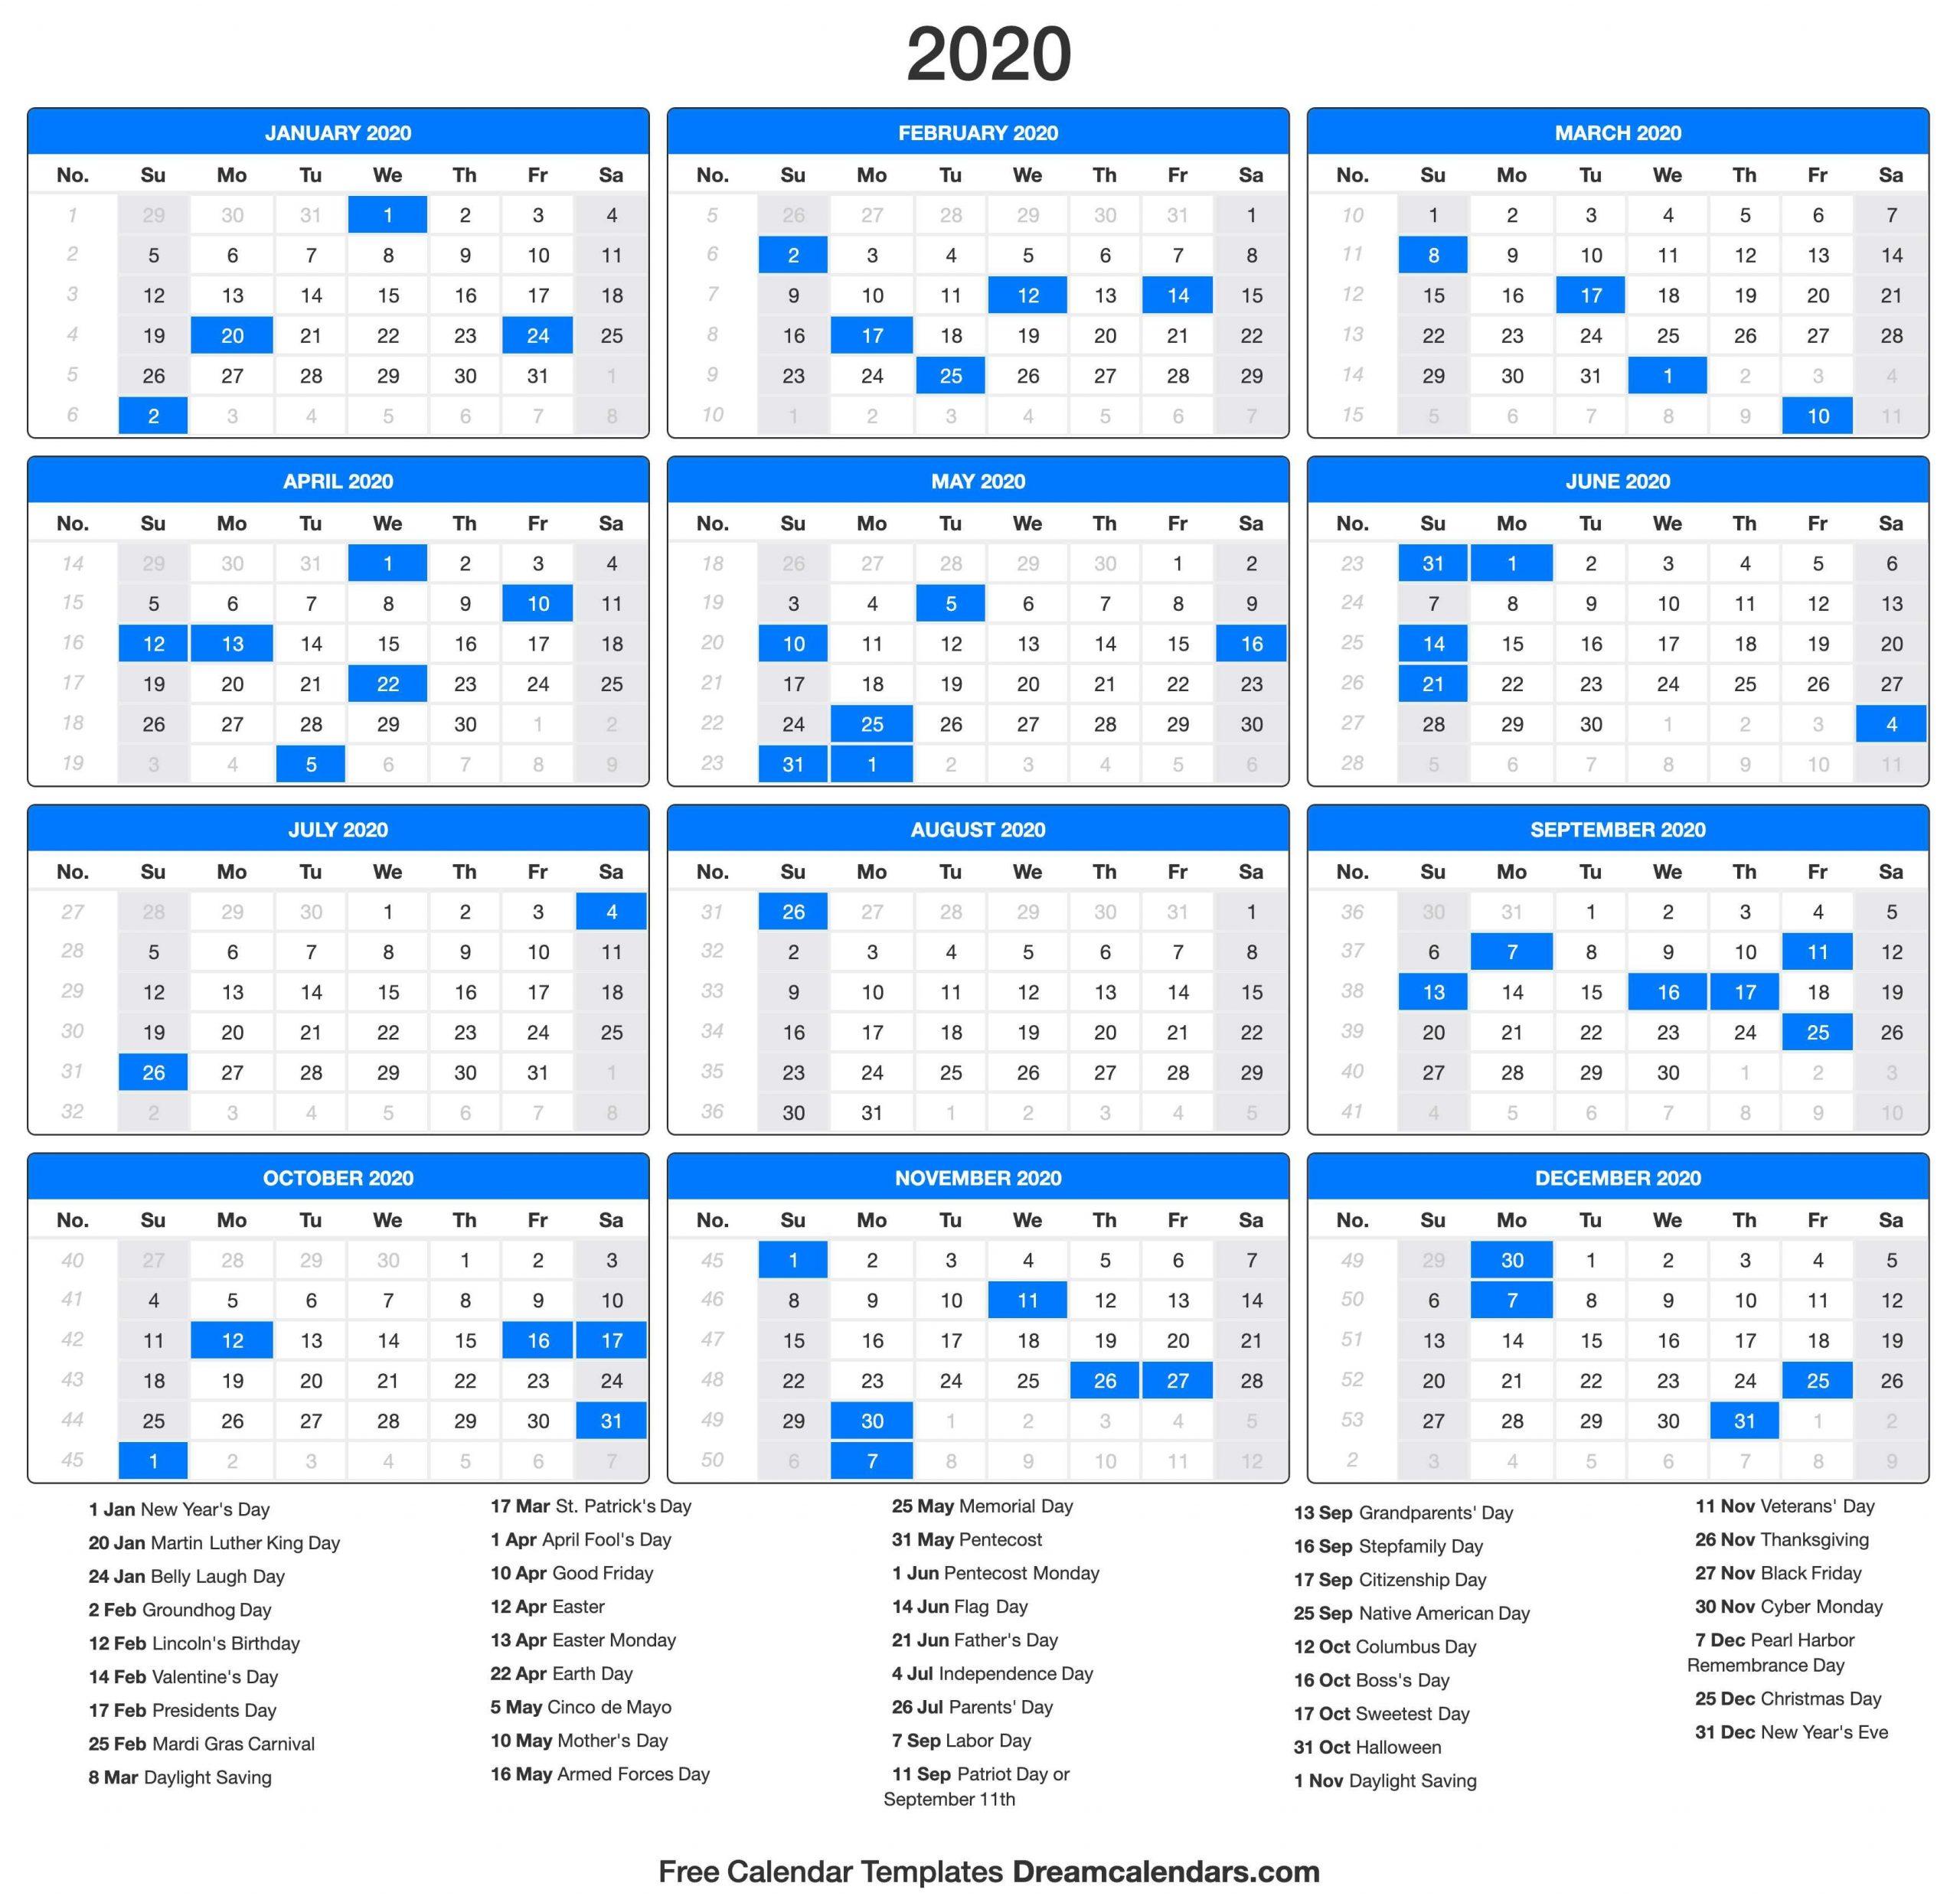 2020 Calendar Calendar Numbered Days 365